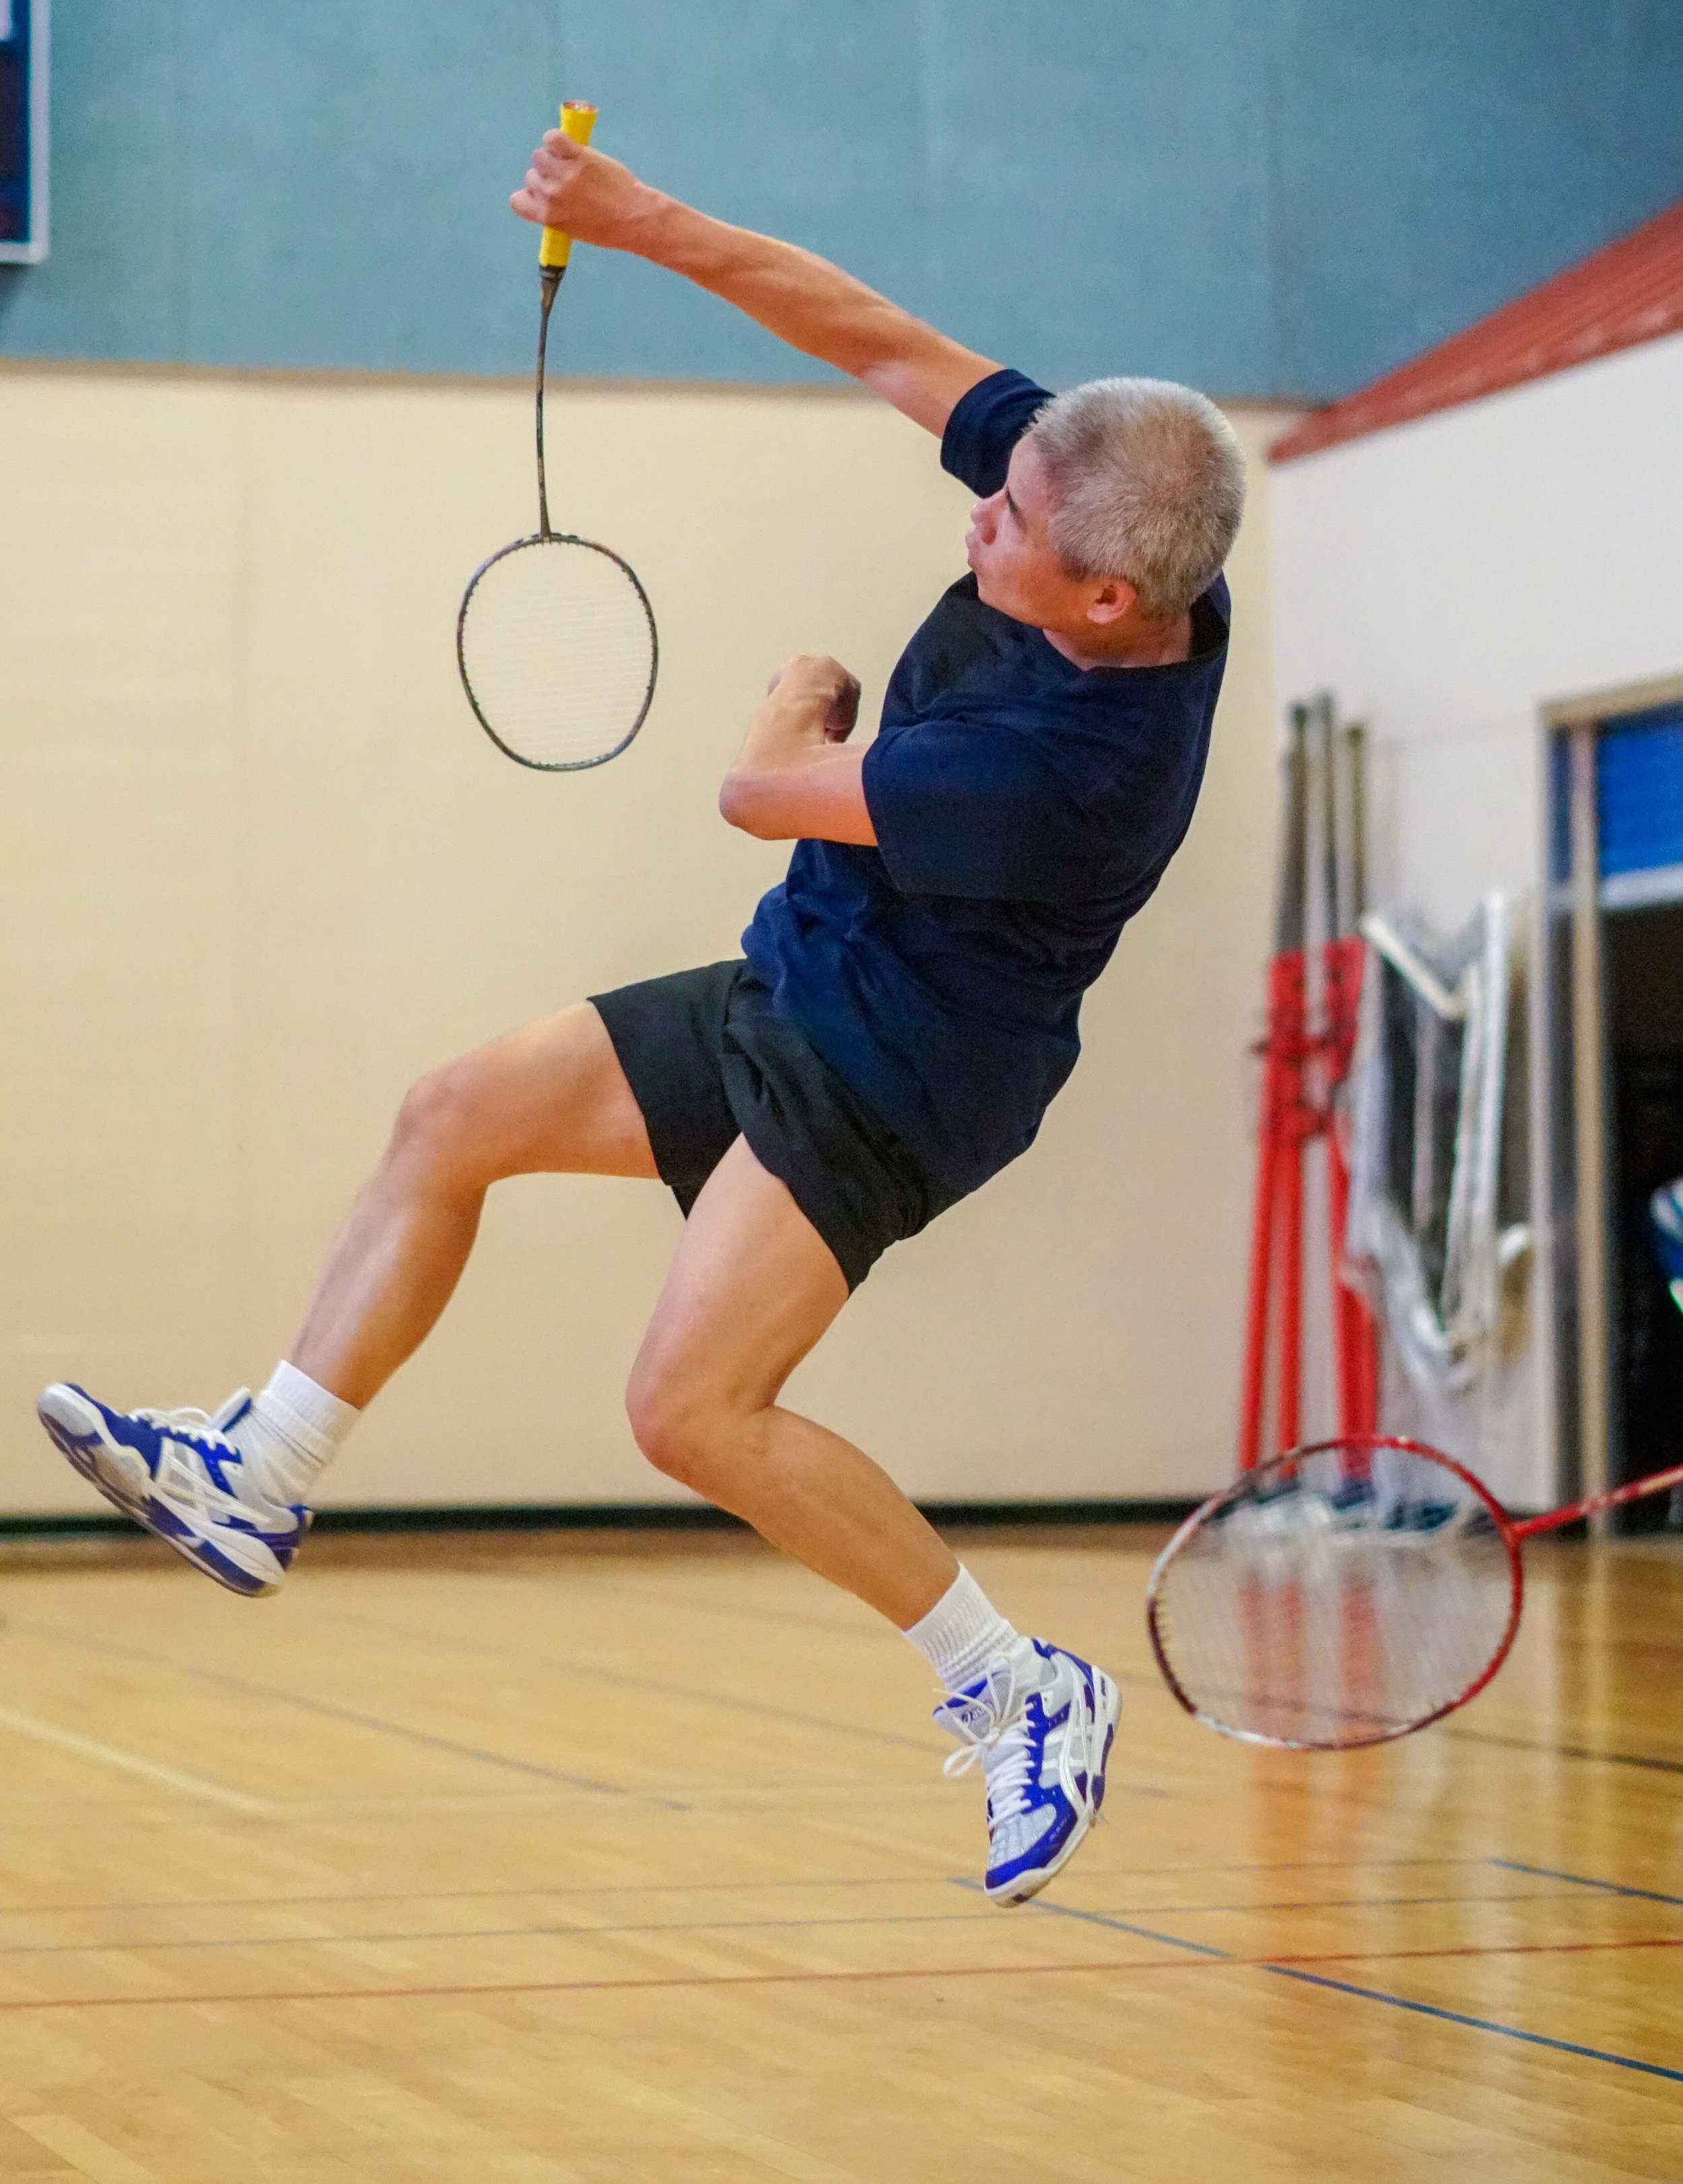 ASG18 Badminton-19.jpg